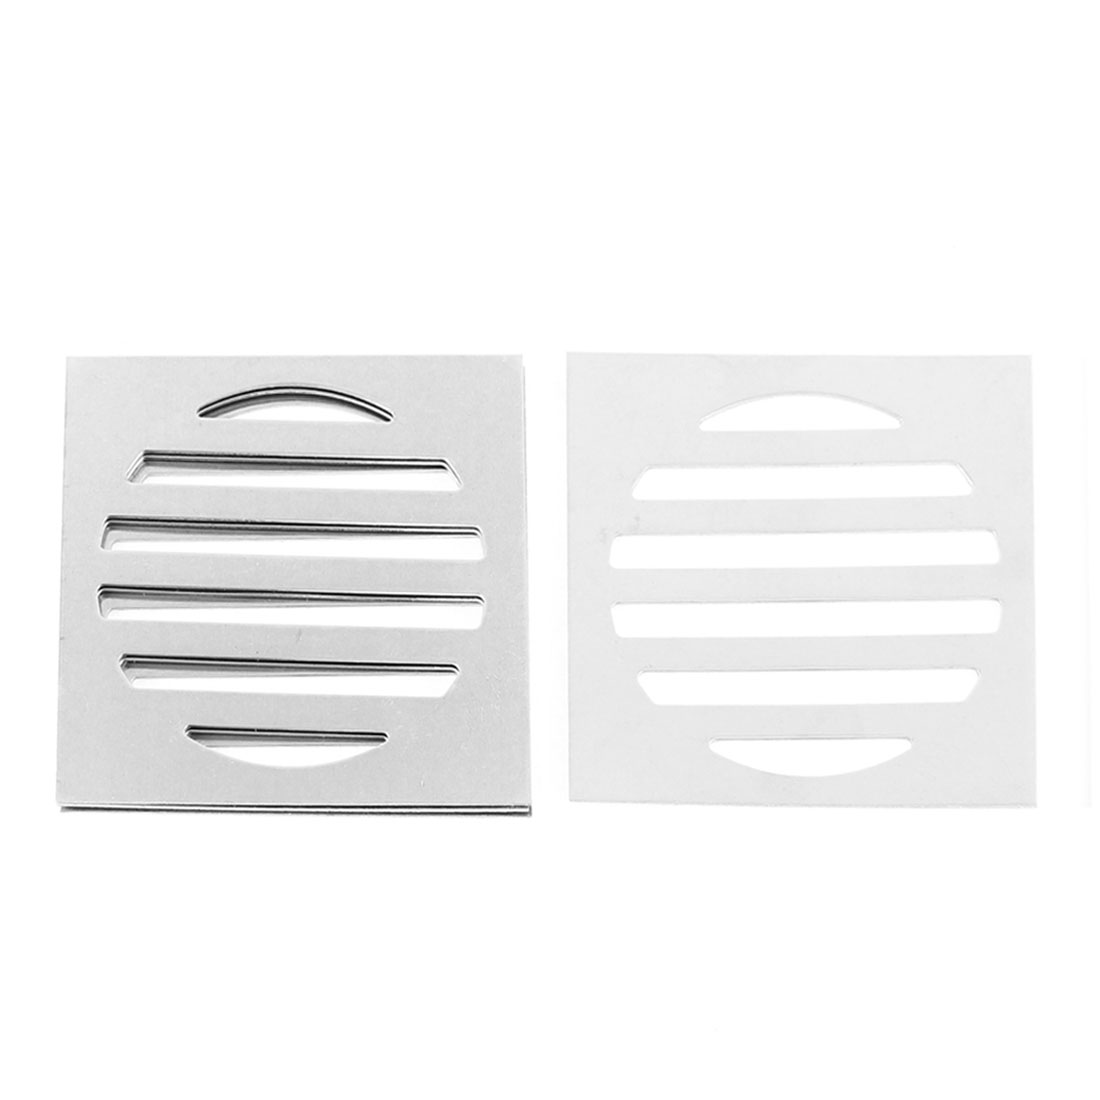 "Stainless Steel Kitchen Bathroom Square Floor Drain Cover 4.4"" 11.3cm 5pcs"